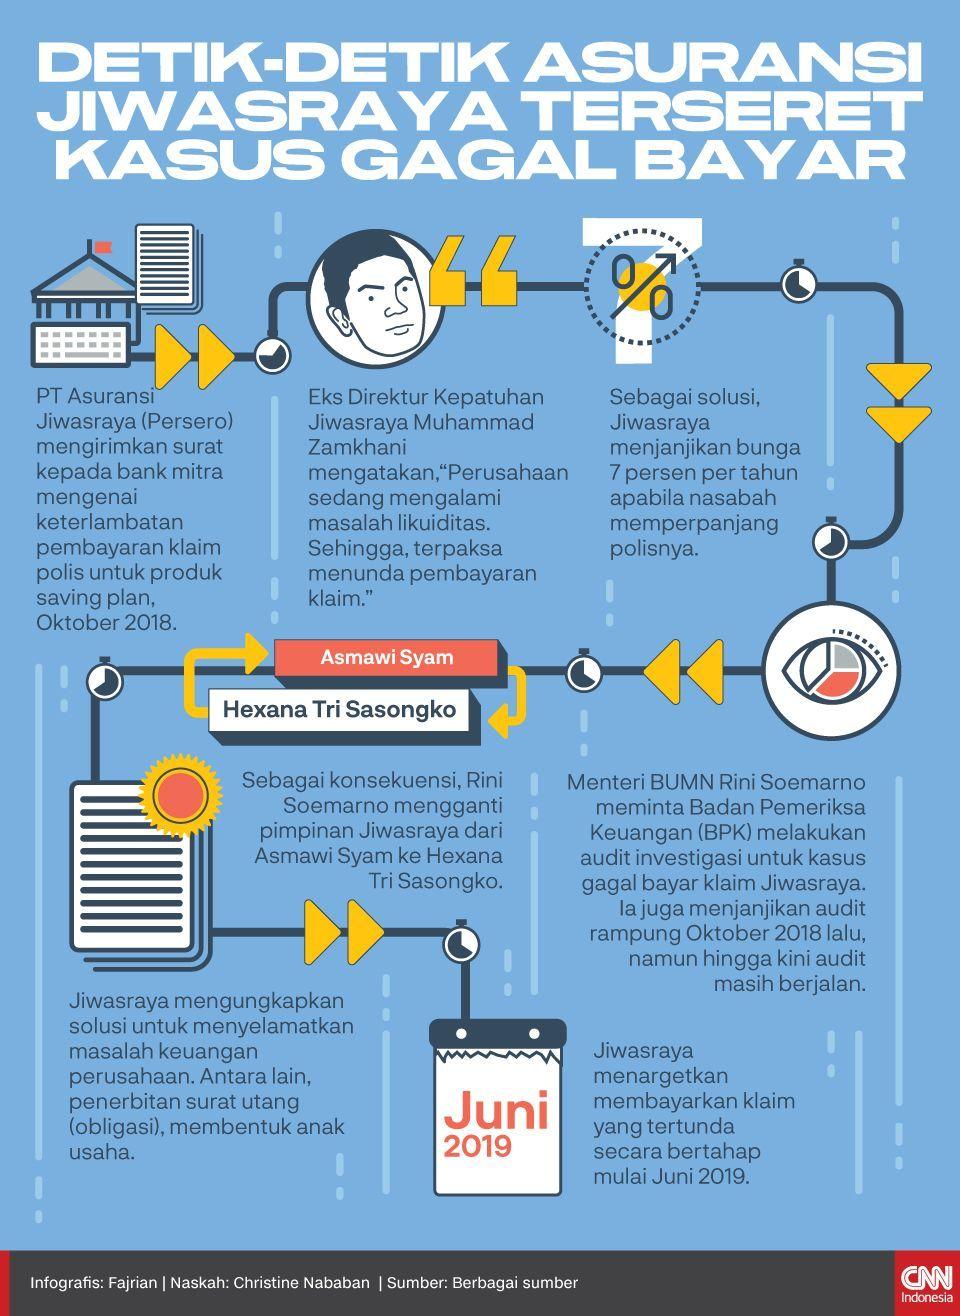 Infografis Detik-detik Asuransi Jiwasraya Terseret Kasus gagal bayar